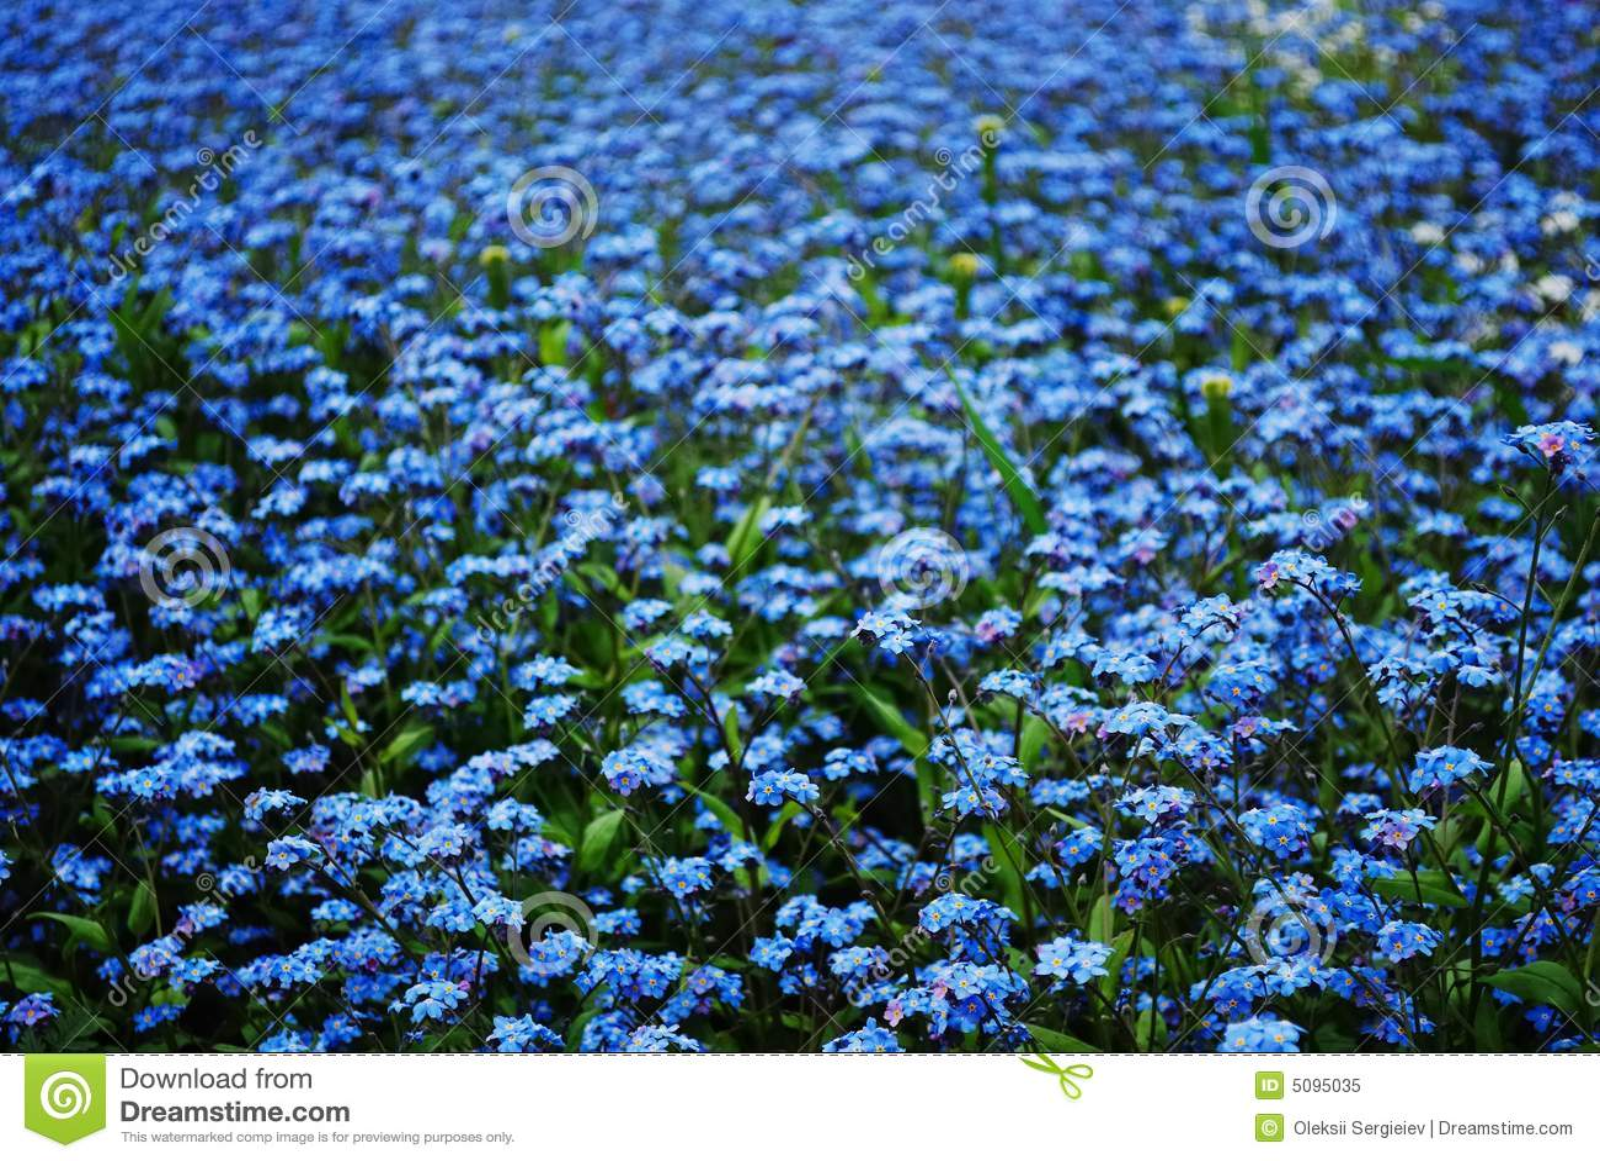 blue forget me nots royalty free stock photo image 5095035. Black Bedroom Furniture Sets. Home Design Ideas